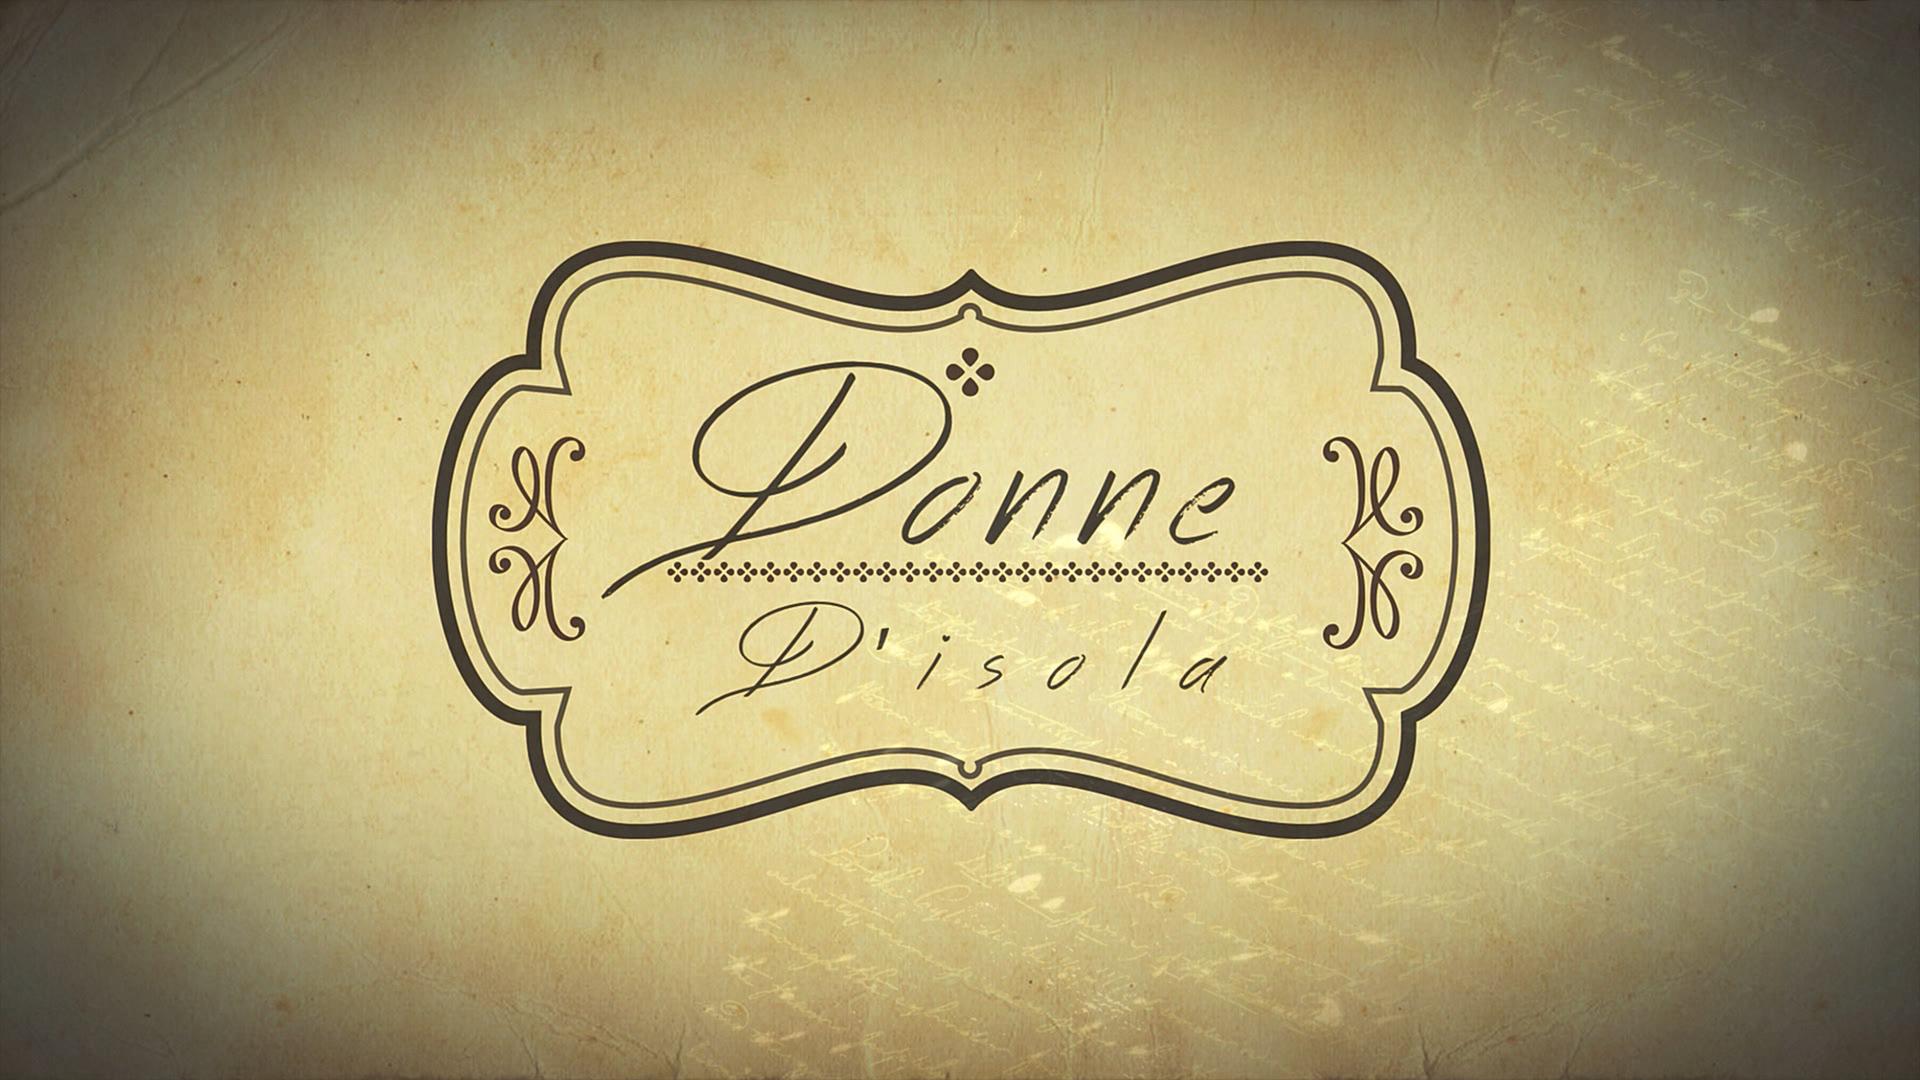 Donne D'Isola